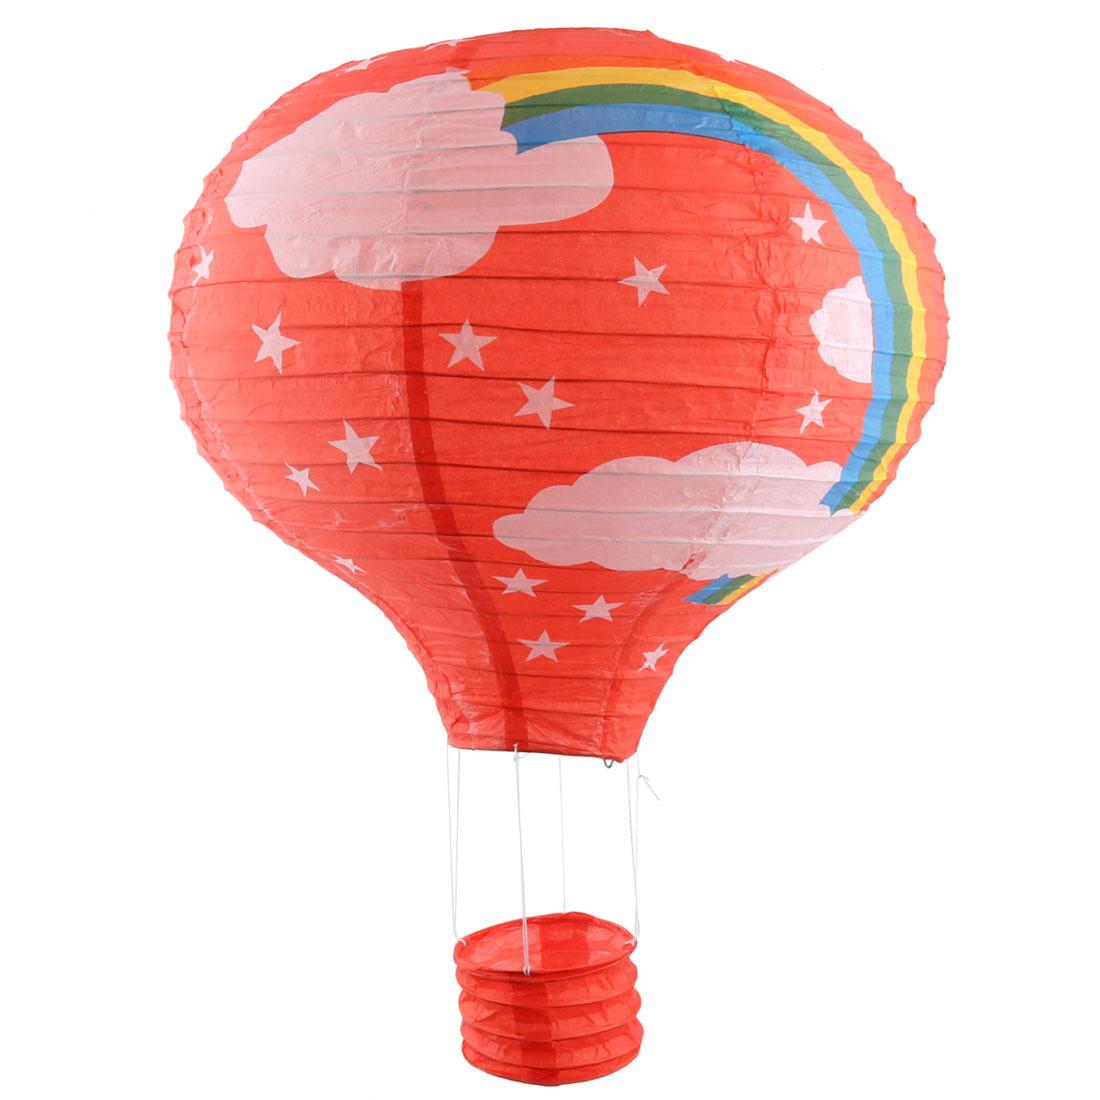 Wedding Festival Paper Rainbow Pattern DIY Decorative Lightless Hanging Hot Air Balloon Lantern Red